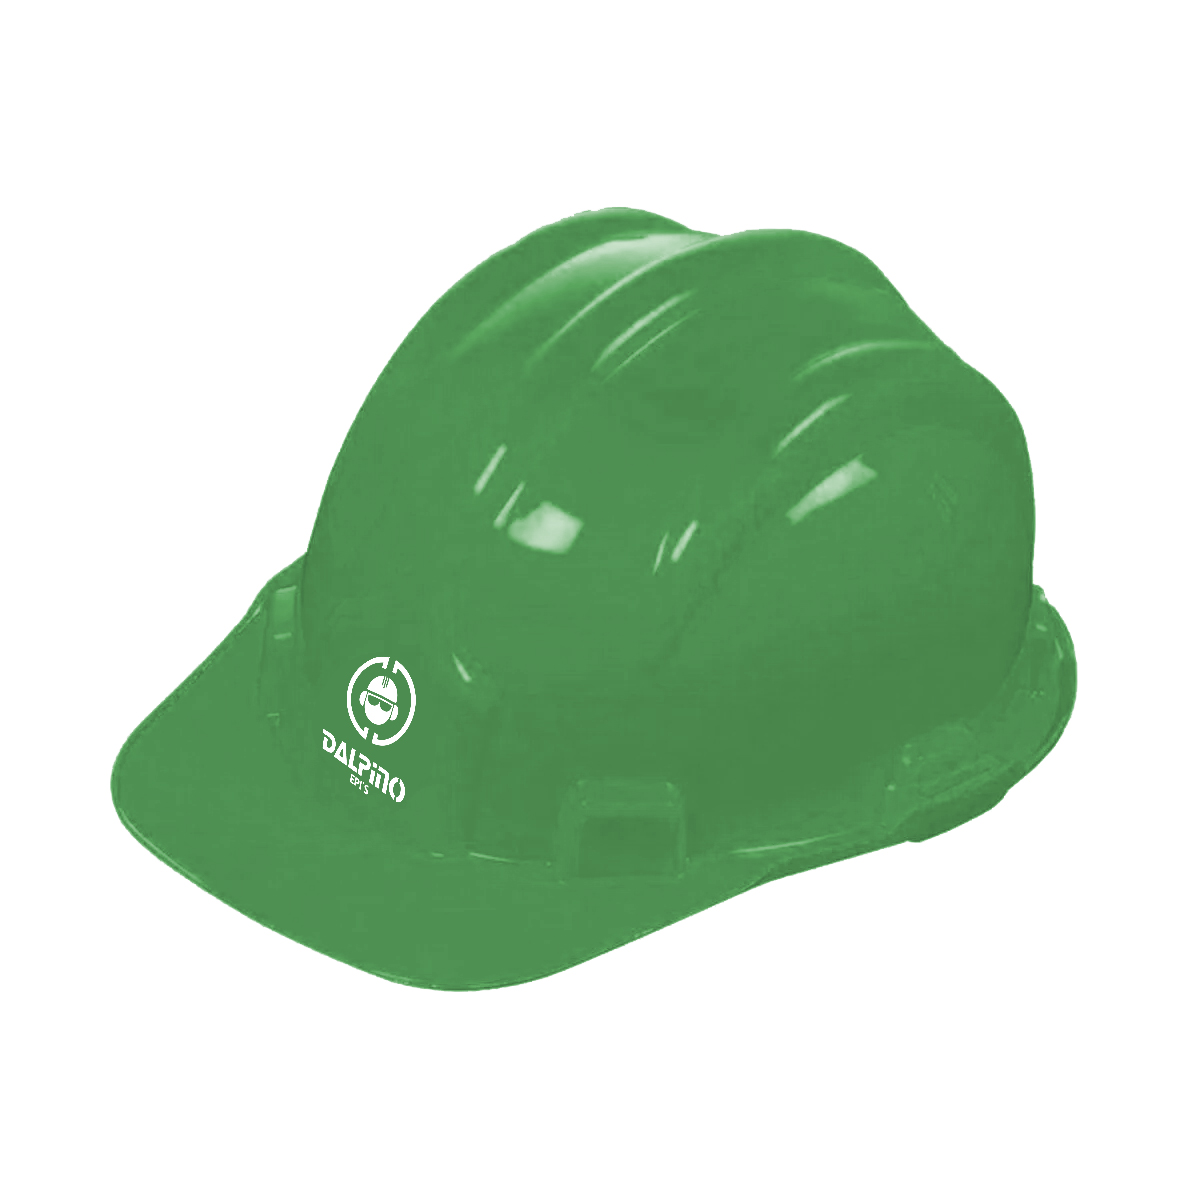 Capacetes de Proteção Plastcor